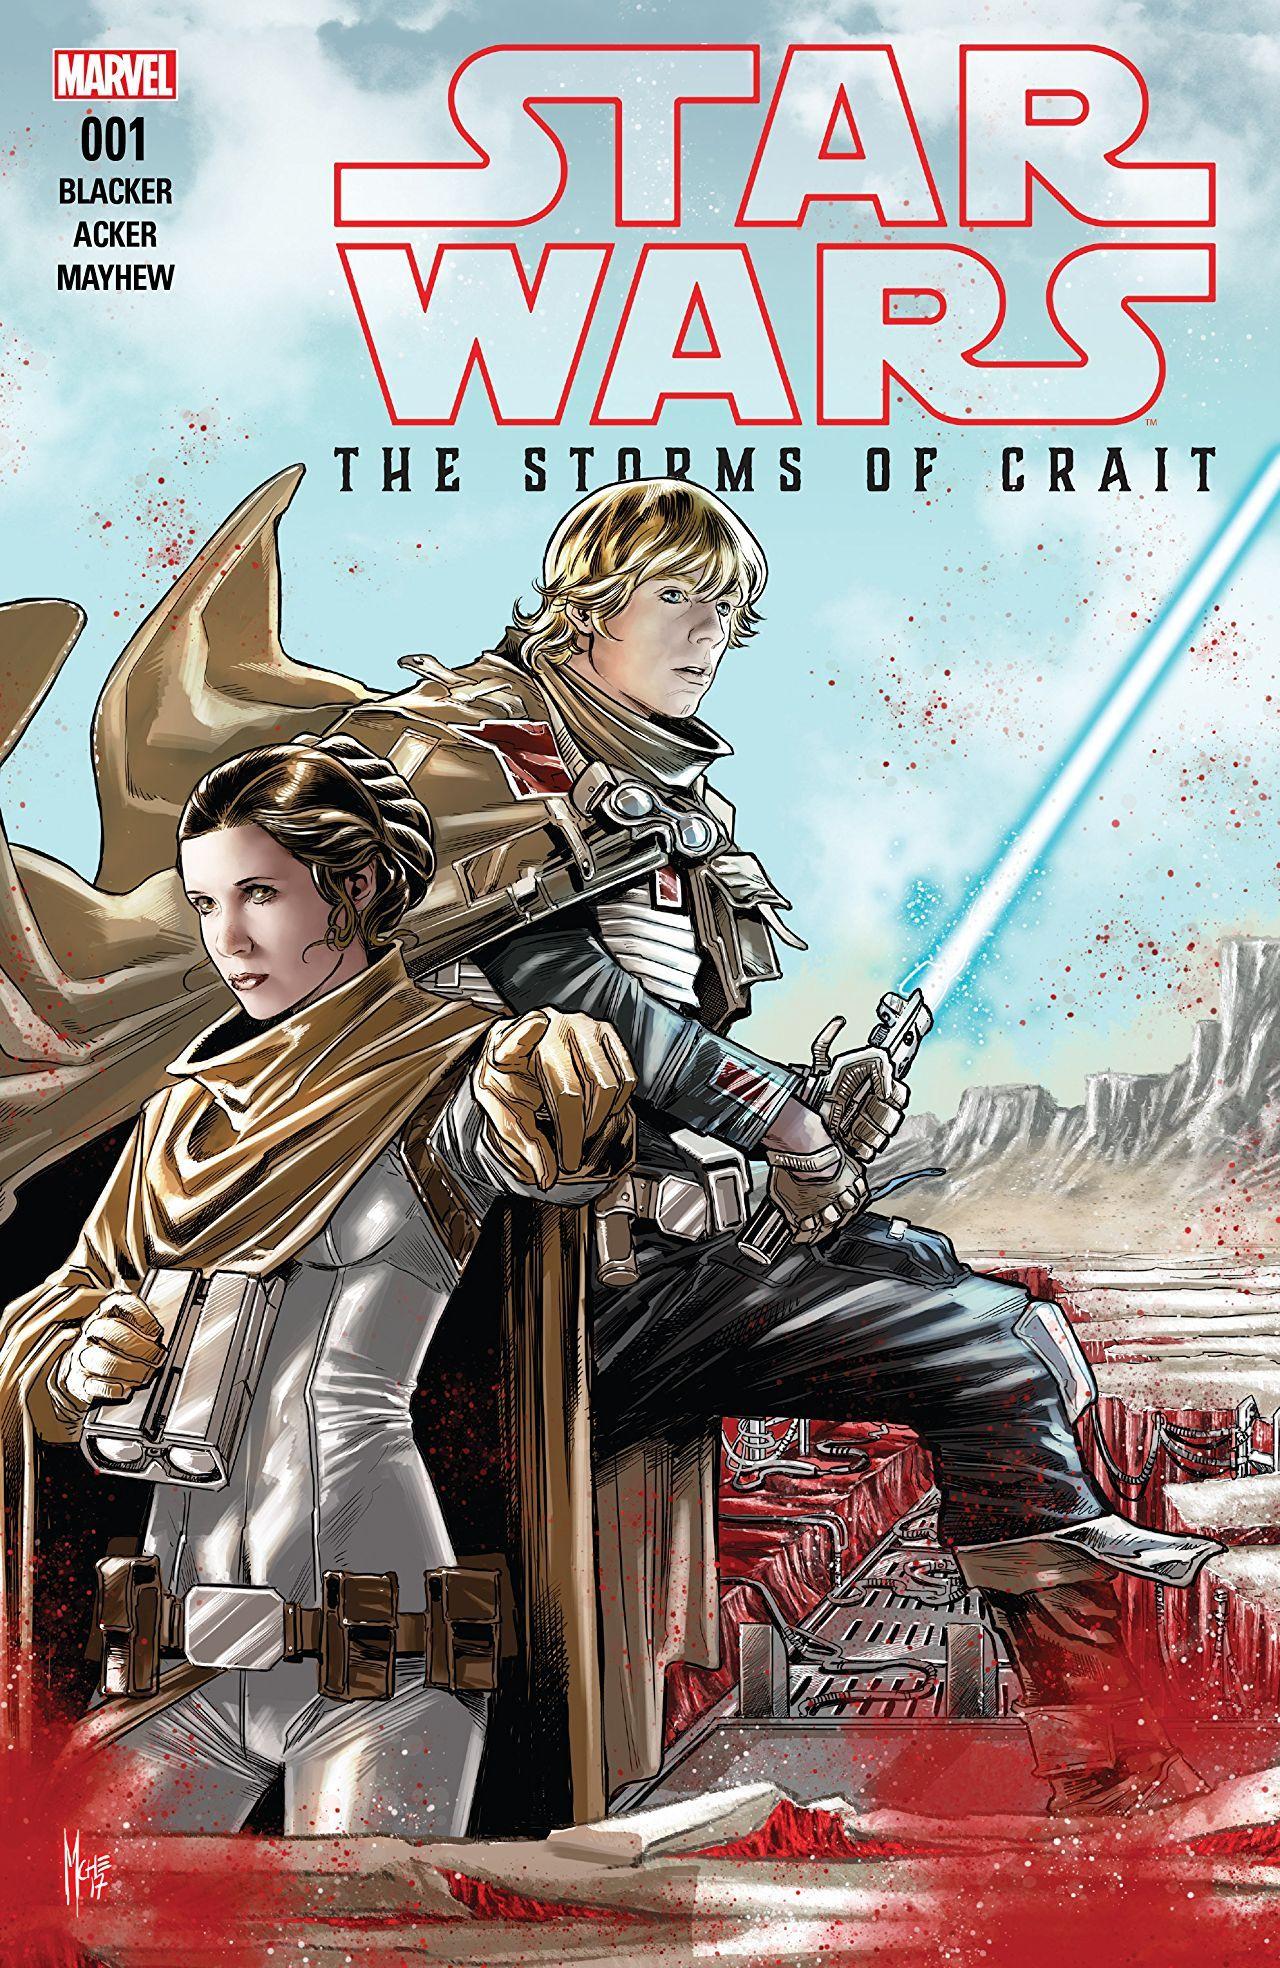 Star Wars Last Jedi Storms of Crait #1 Wijngaard Variant